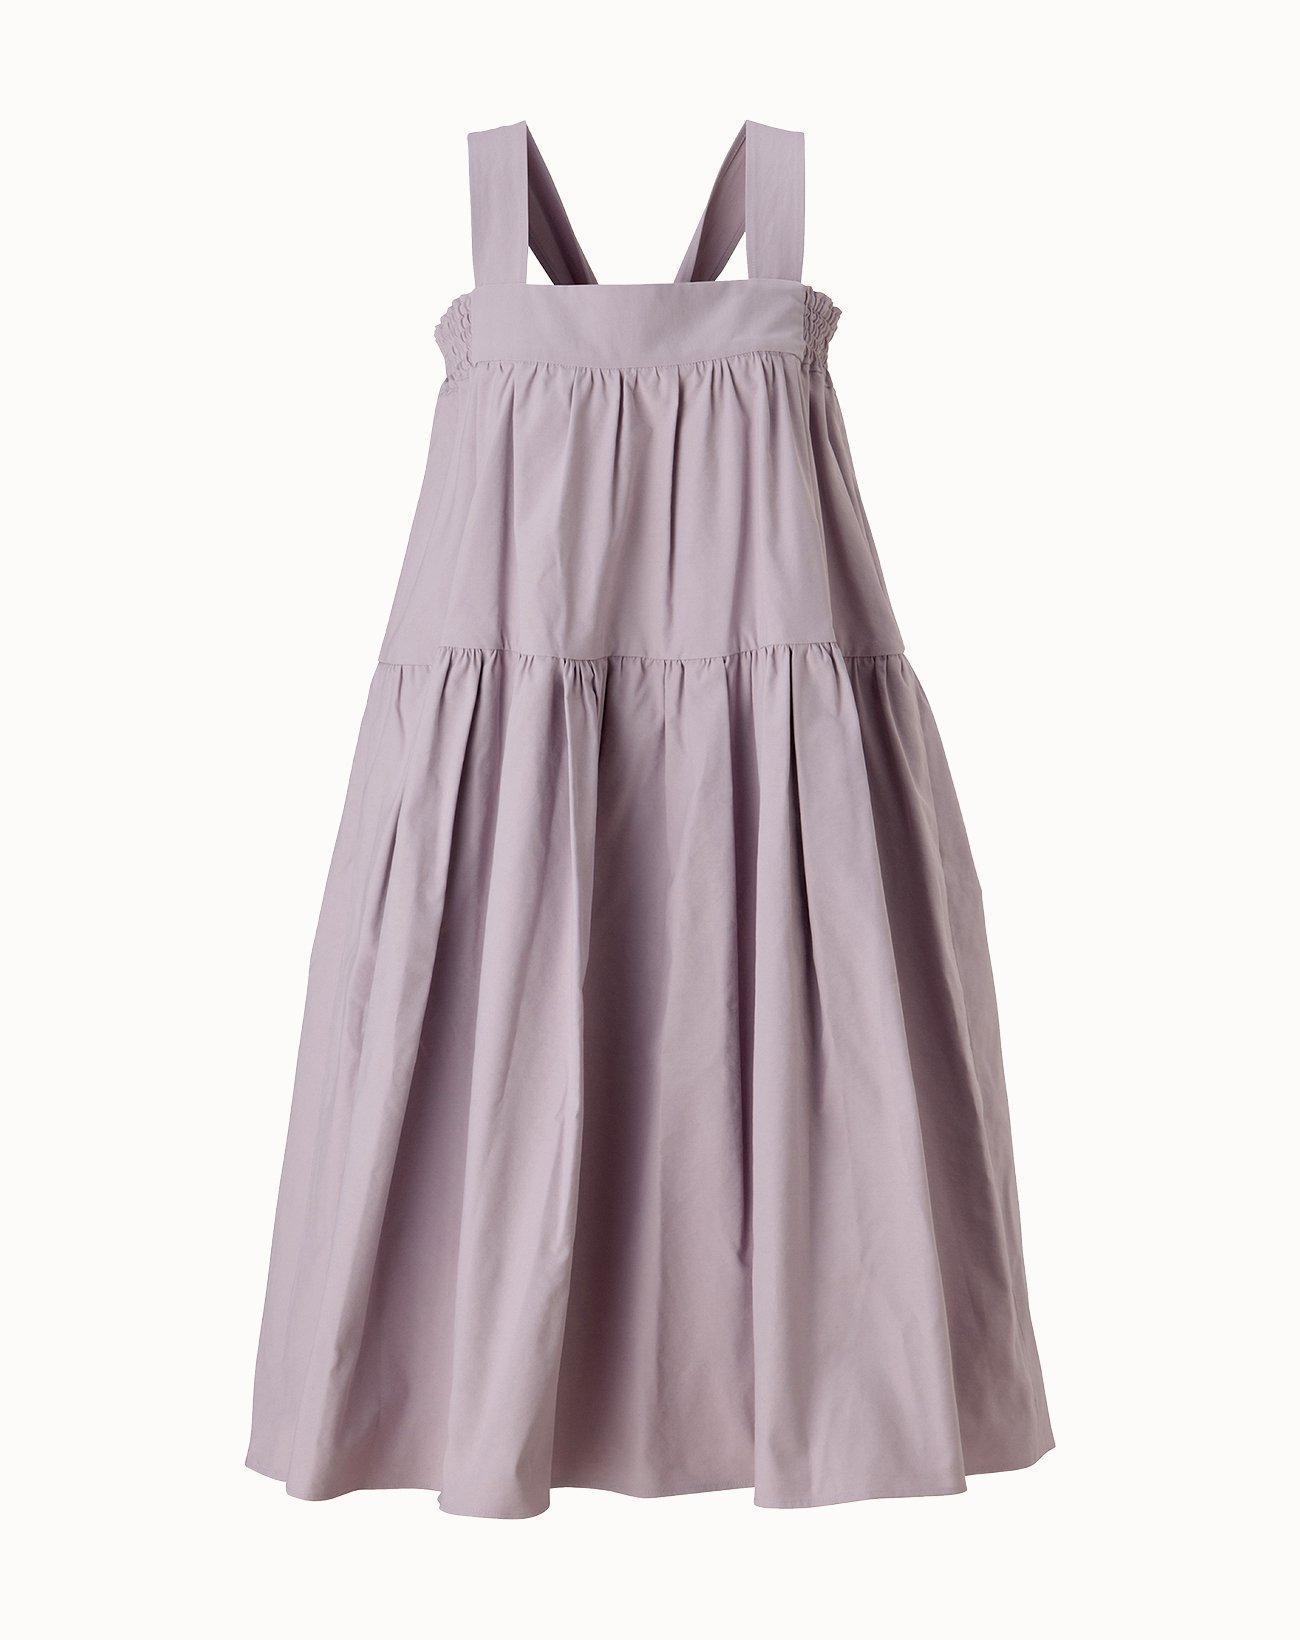 Vintage Twill Dress - Lavender